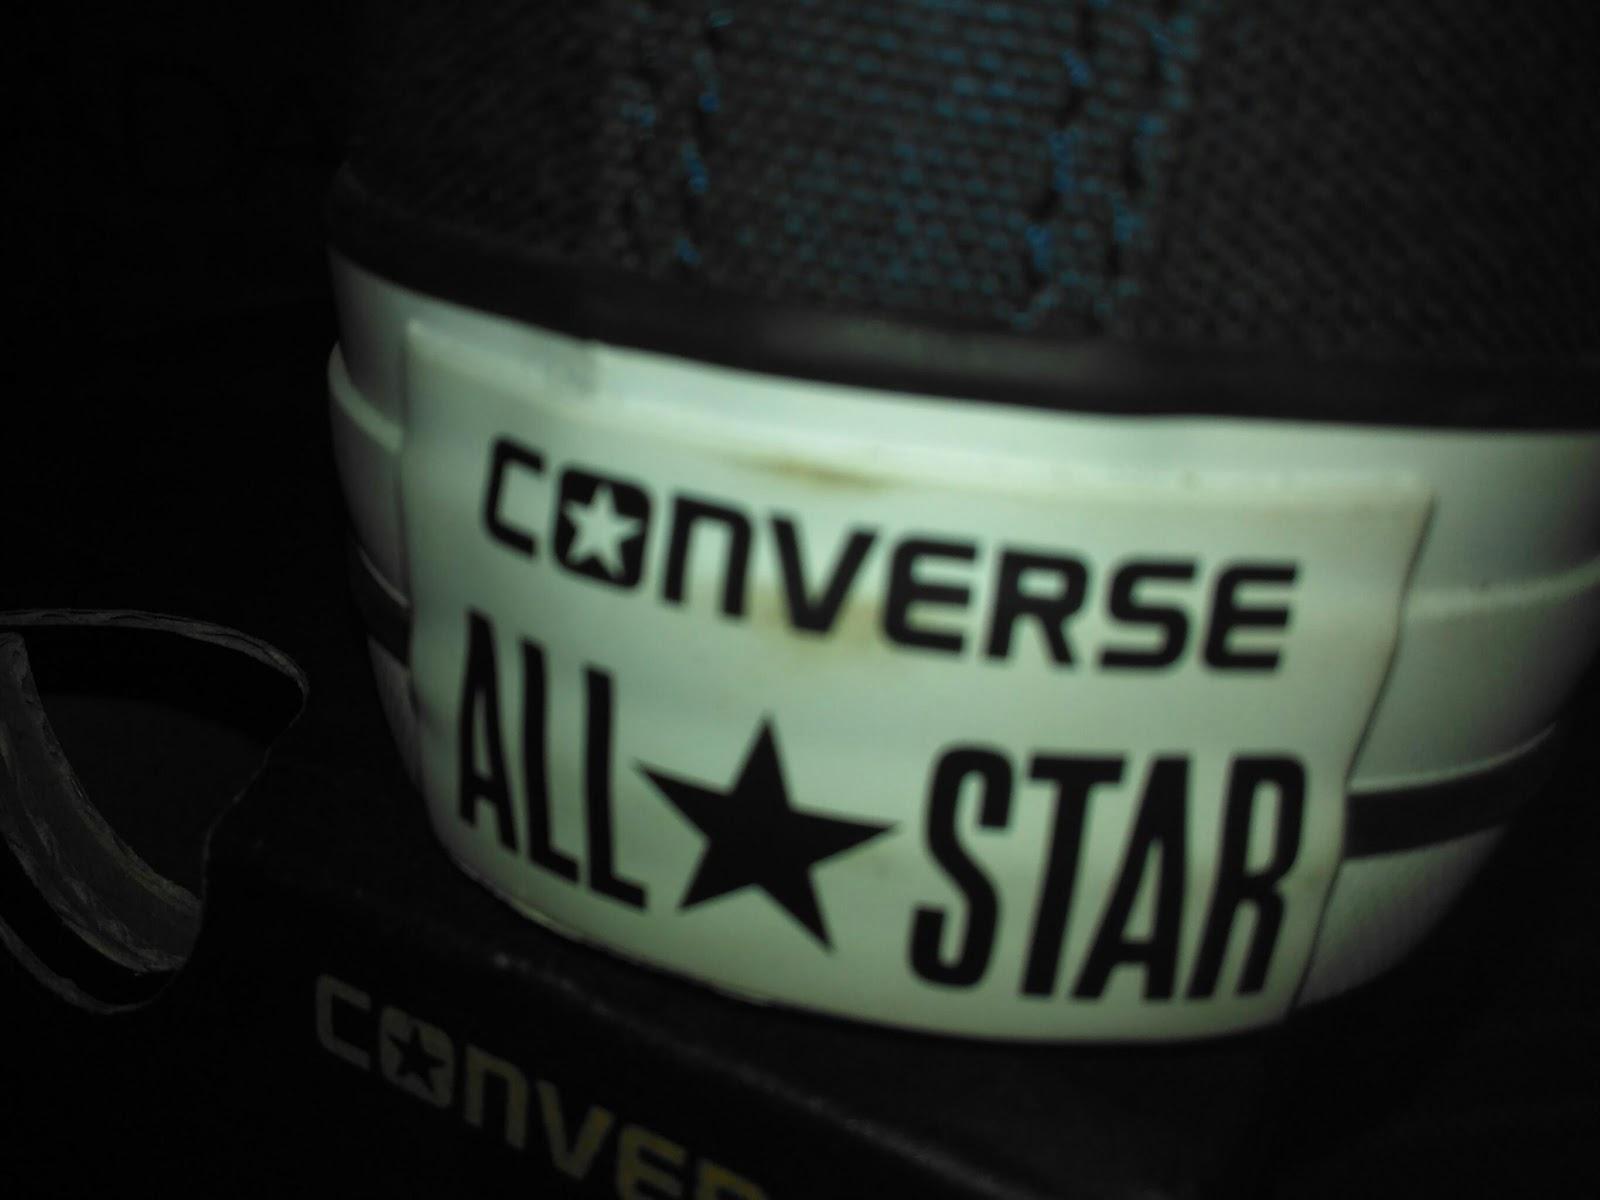 Produk yang saya beli adalah sepatu Converse Chuck Taylor All Star Ox  Canvas dan jam tangan Casio. Cukup puas saya belanja di Lazada f8300399ae